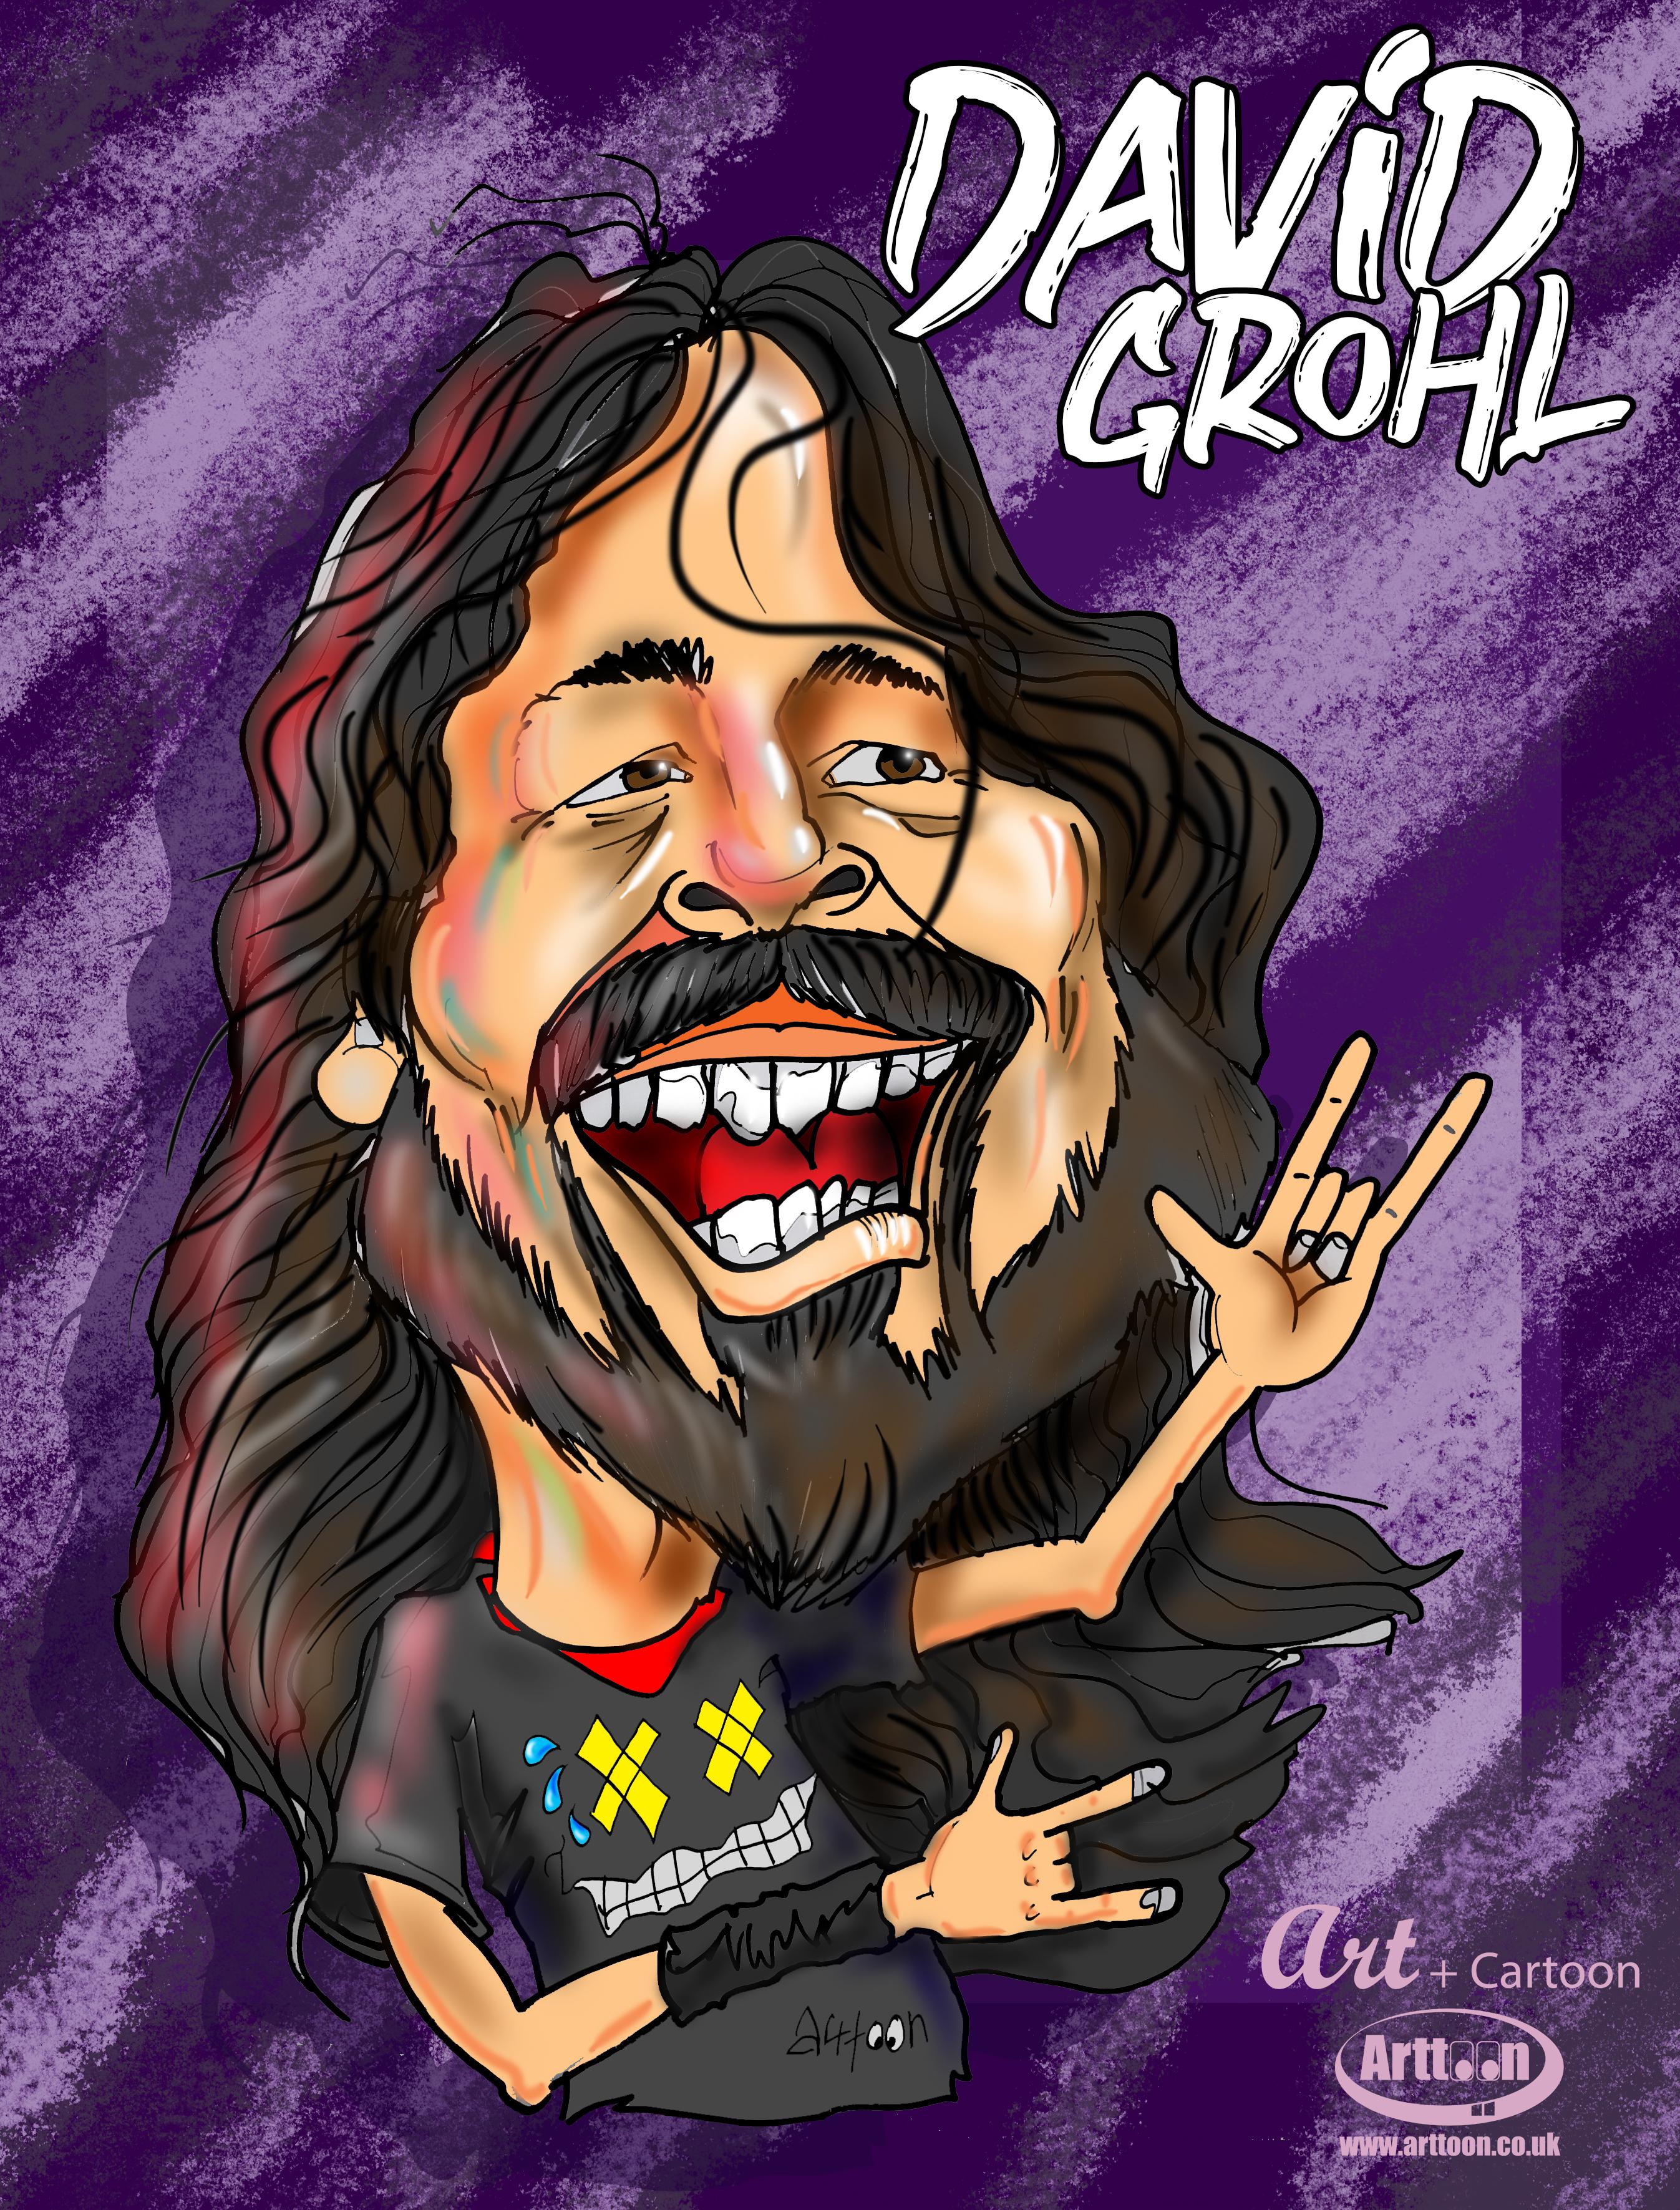 David Grohl